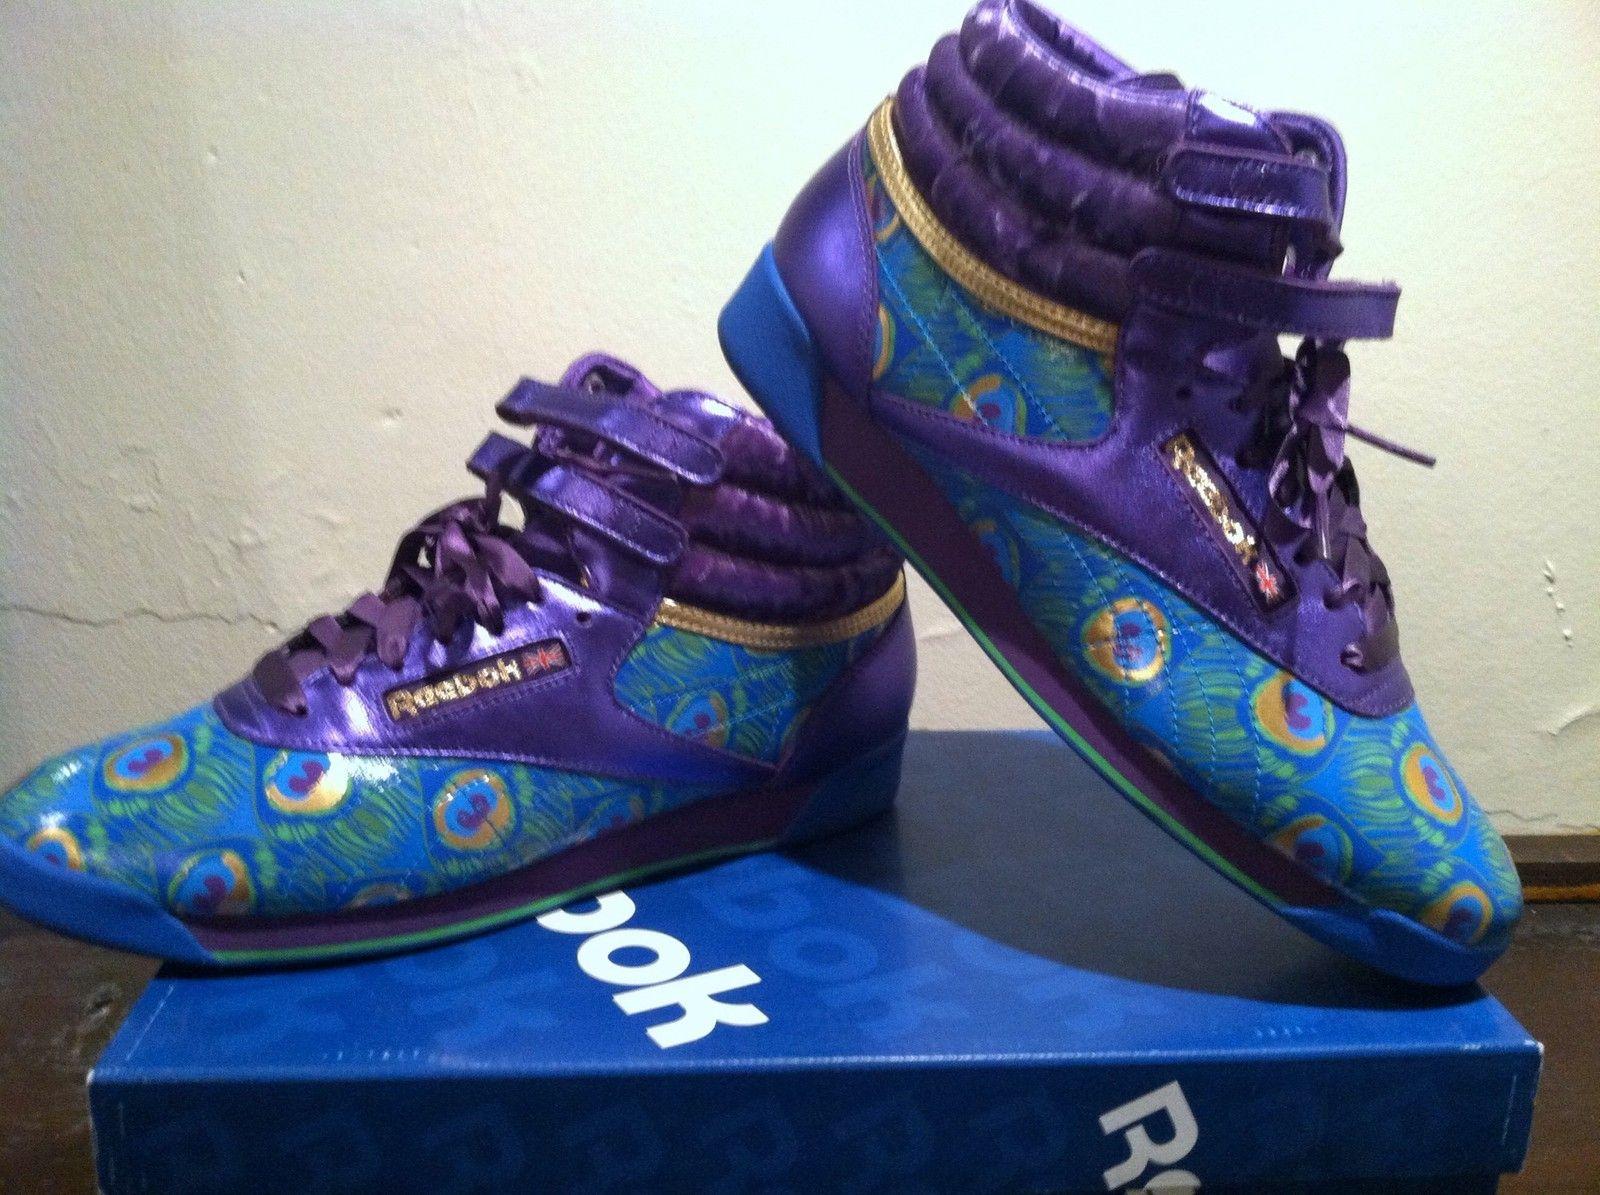 Purple Hi Wmns Blue Classic Freestyle Reebok Mythology 9 Green l1cFJT3K